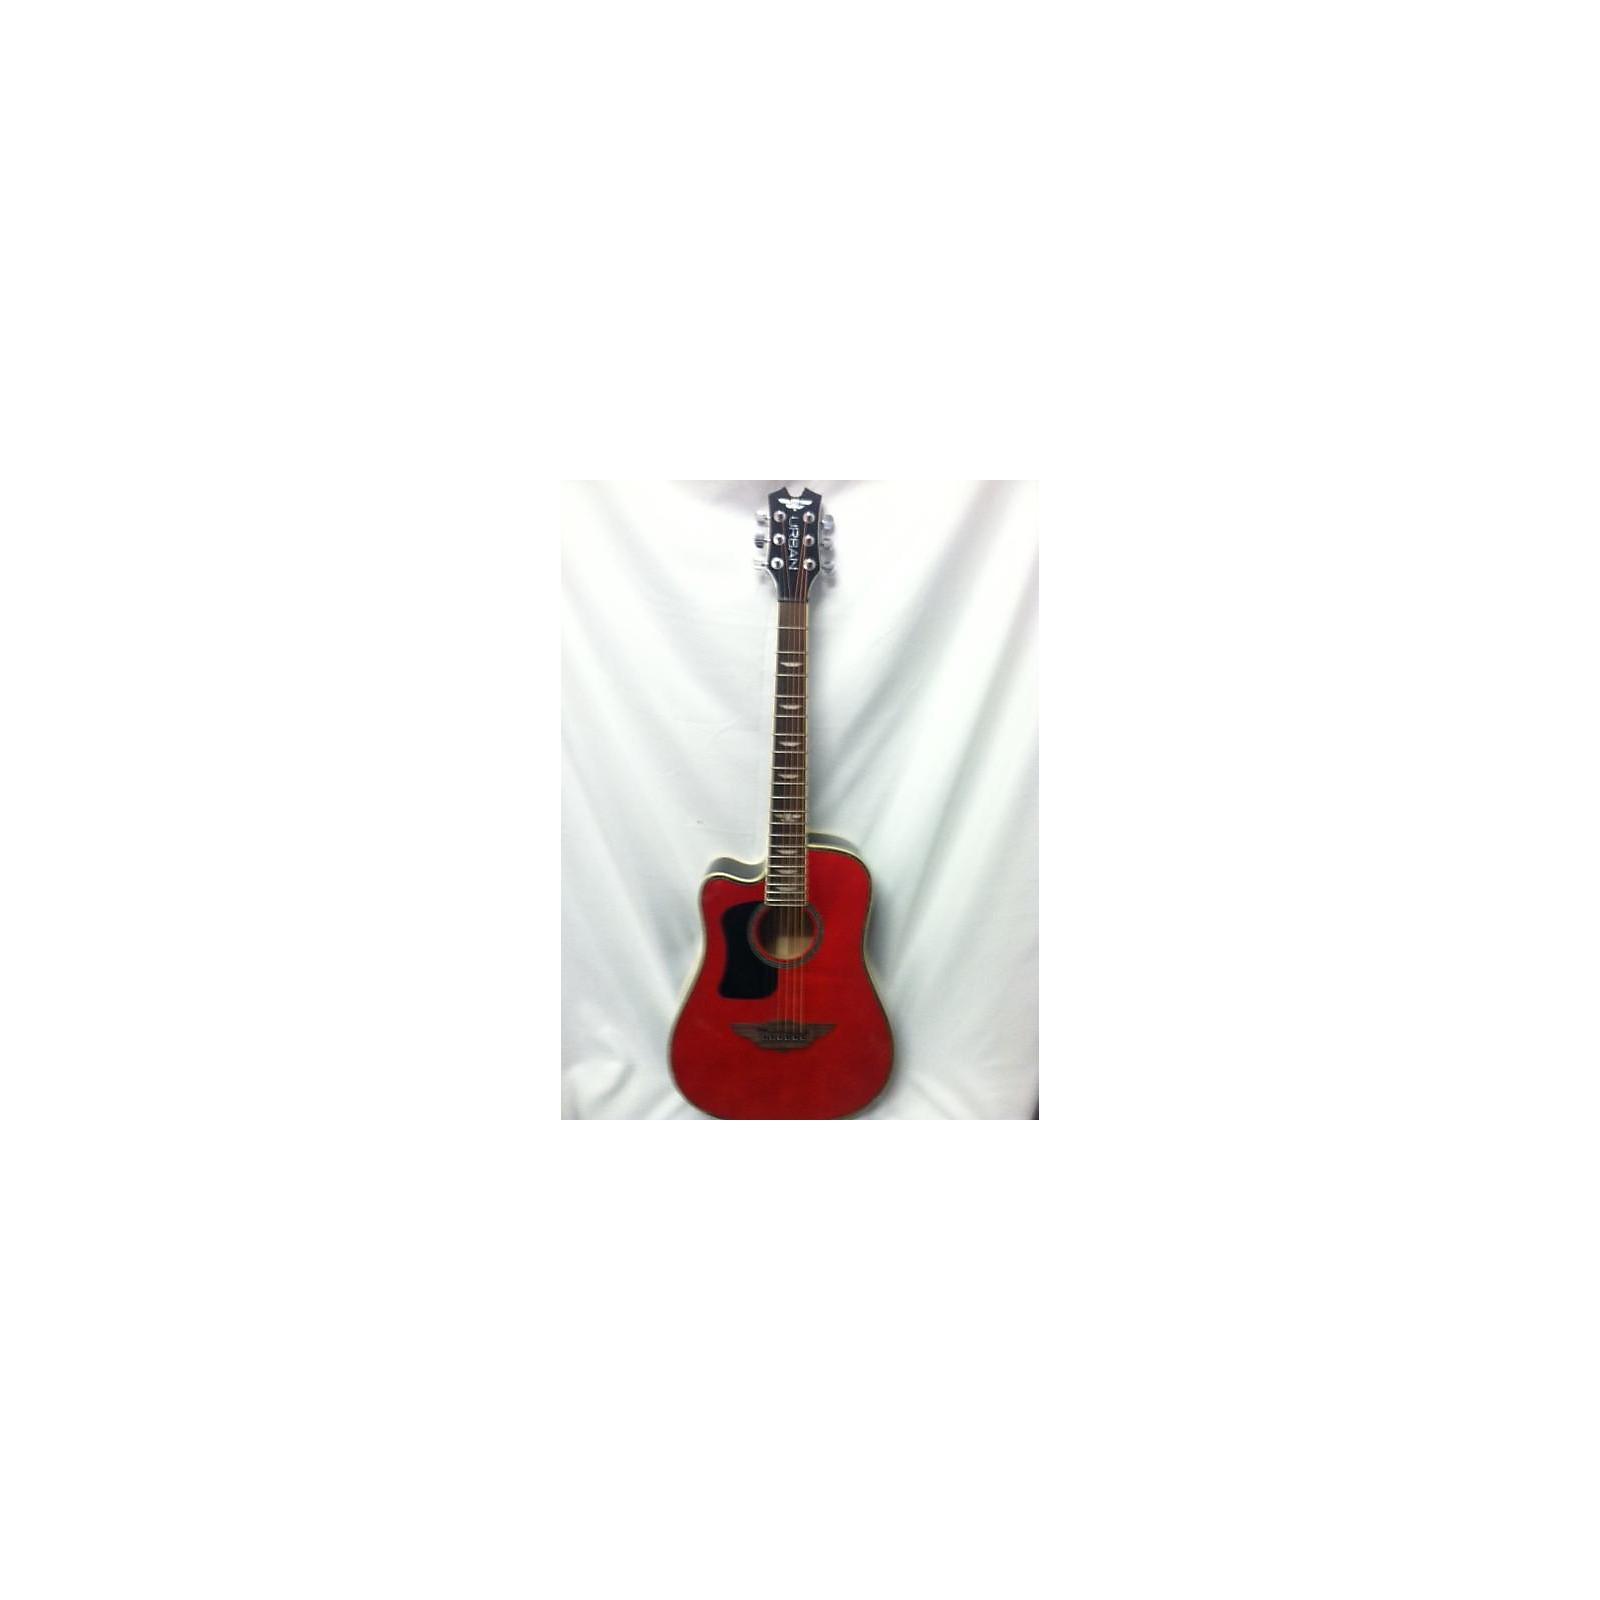 Keith Urban Junior Player Left Hand Acoustic Guitar